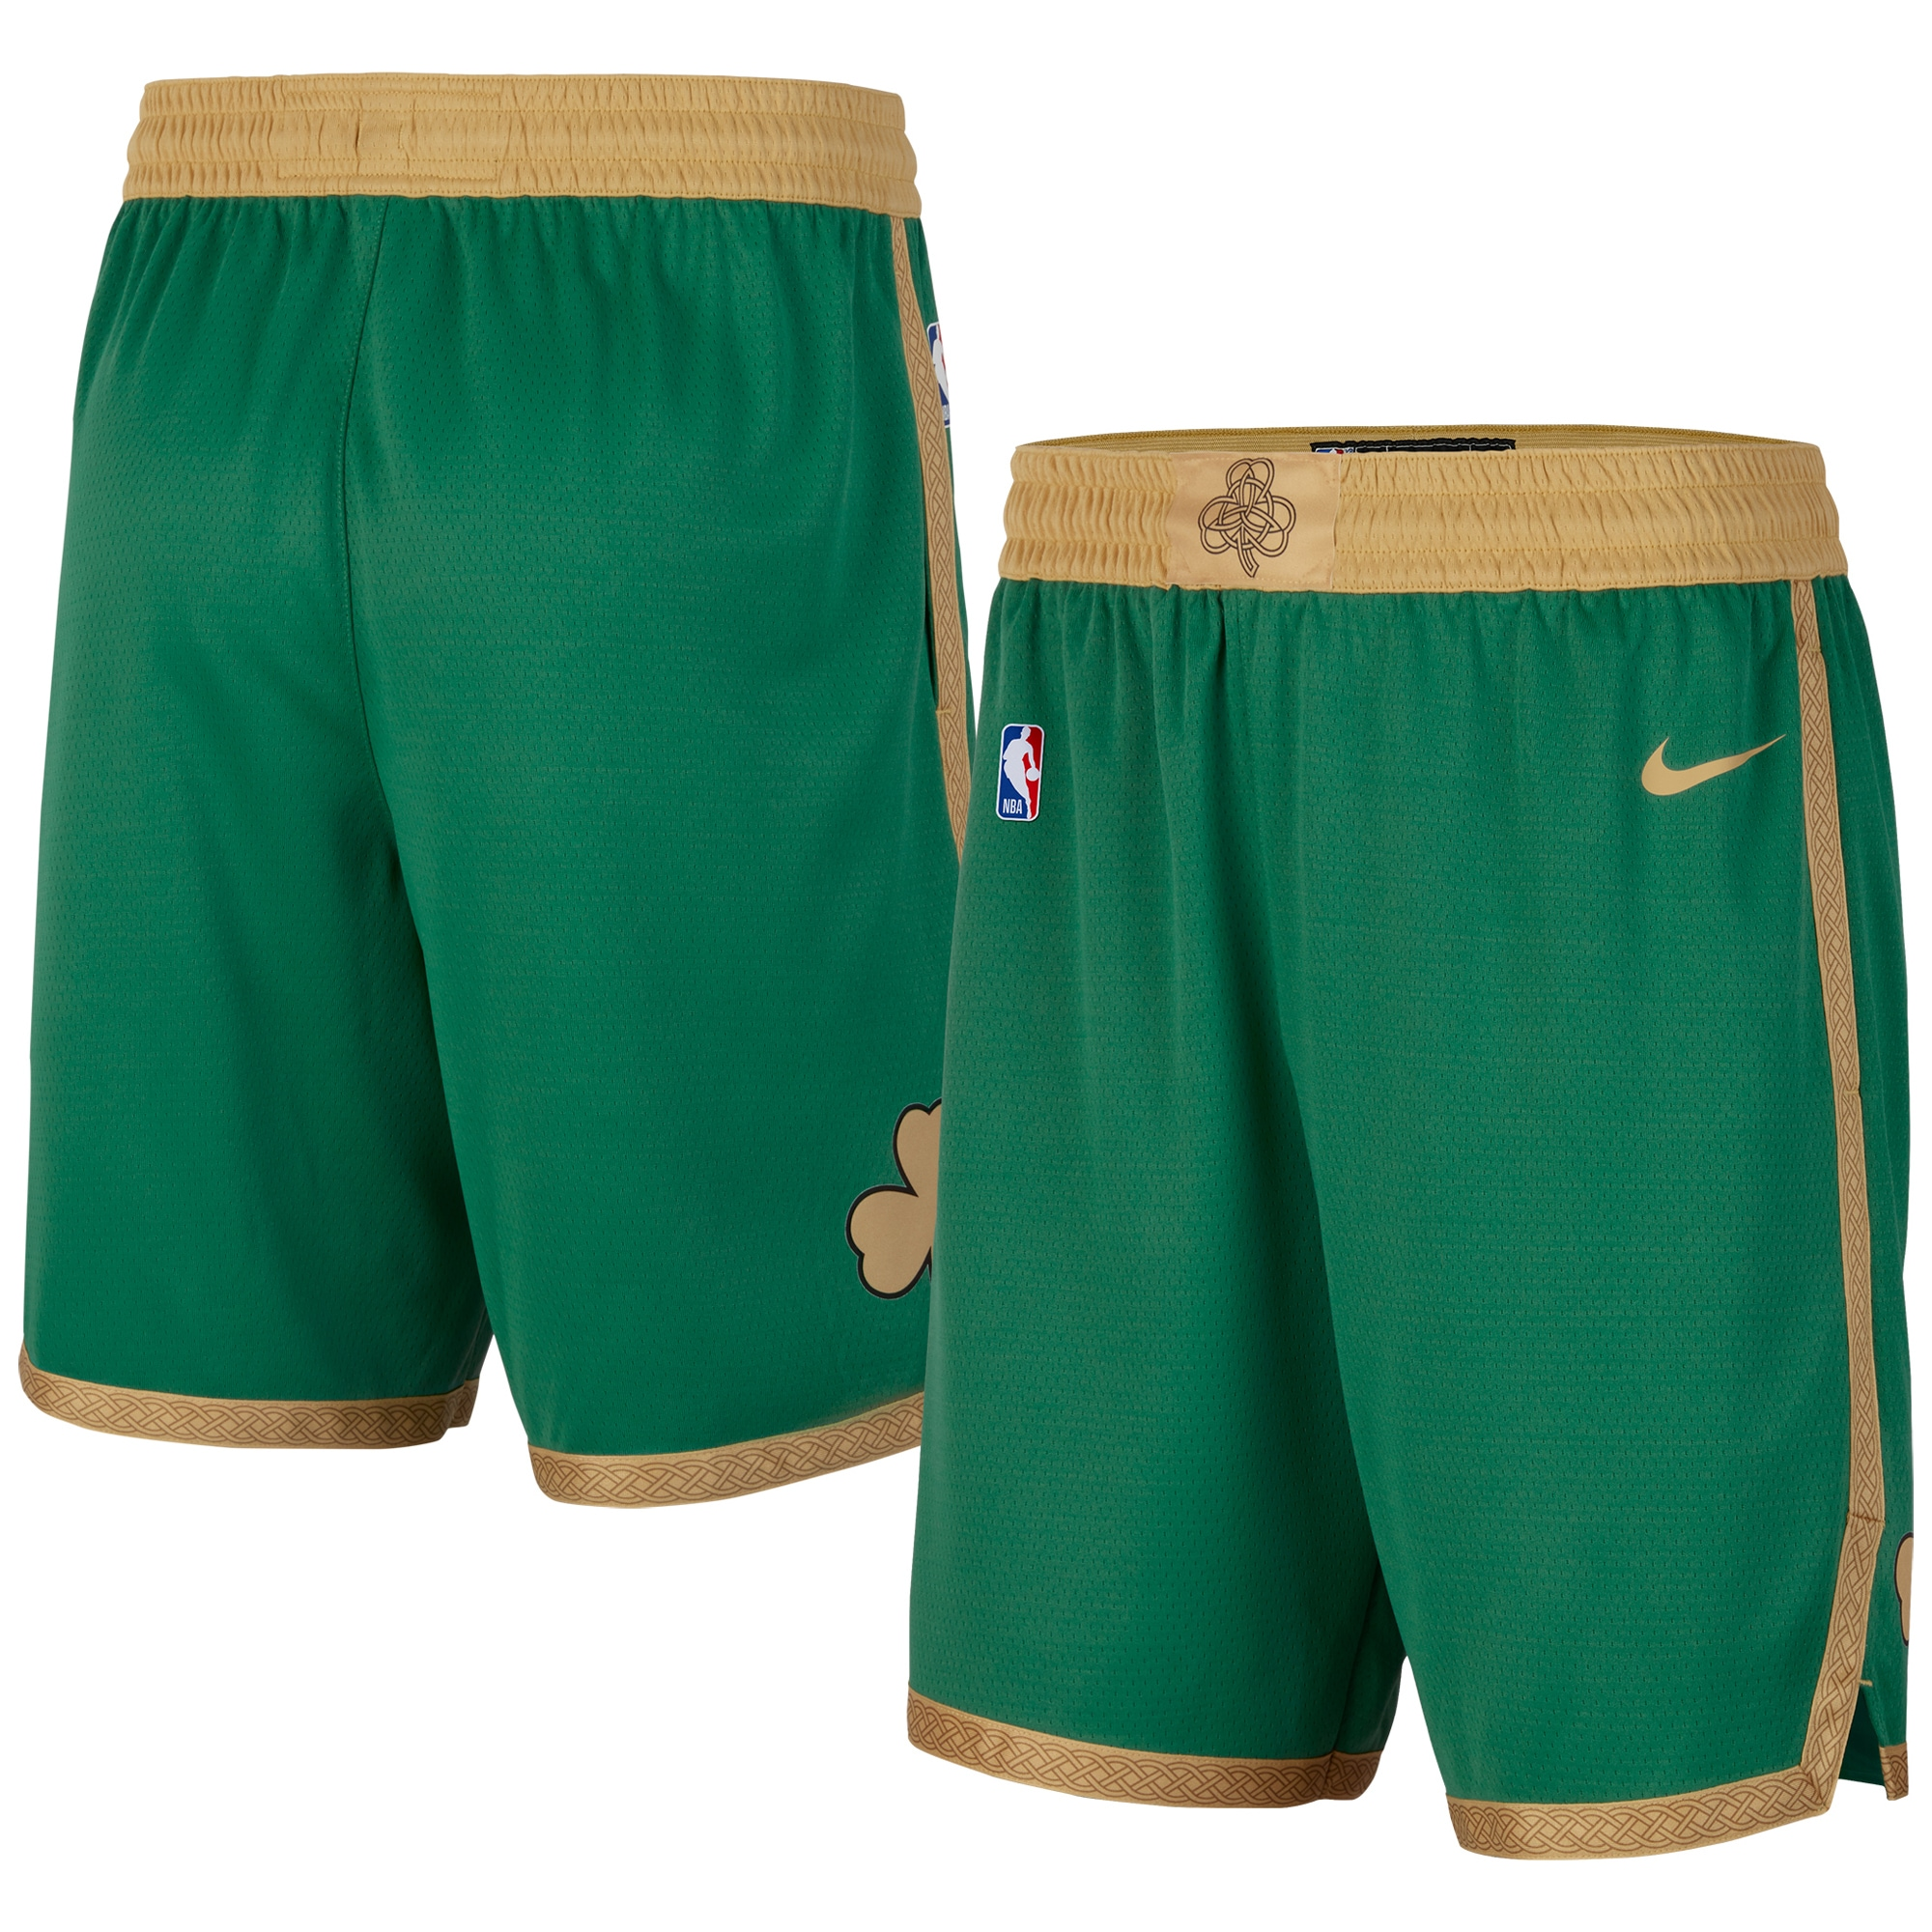 Boston Celtics Nike 2019/20 City Edition Swingman Shorts - Green